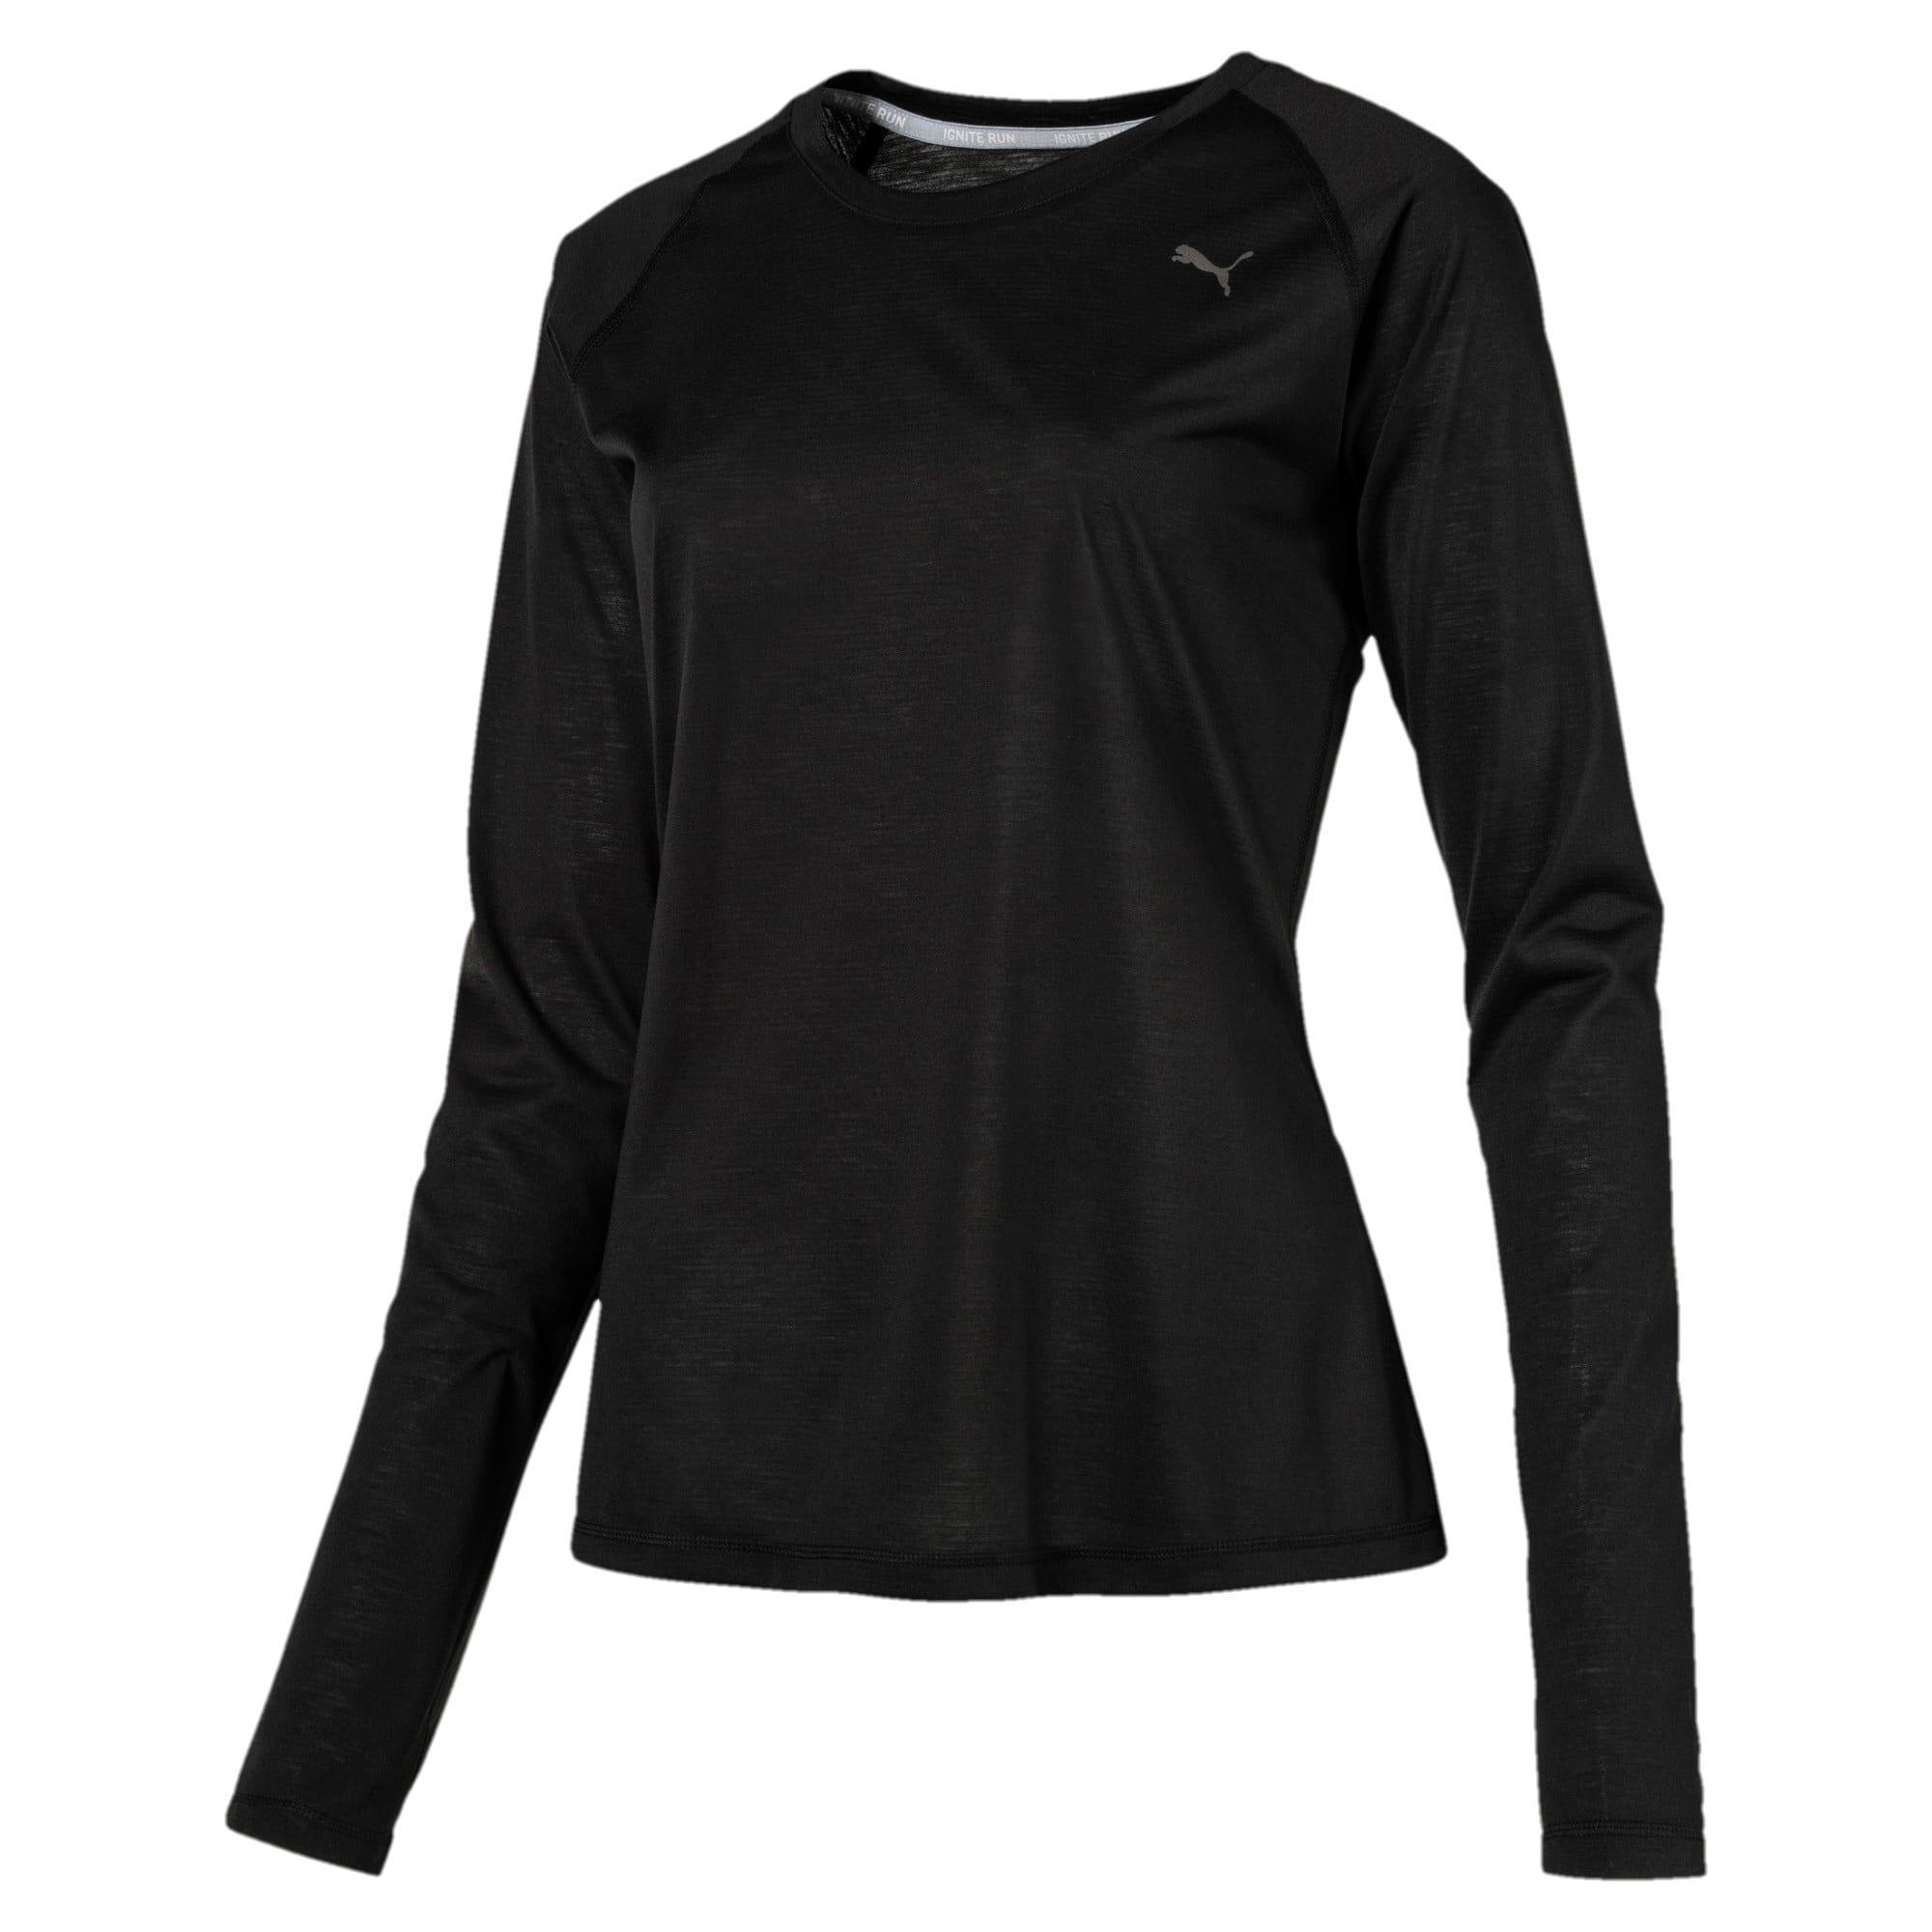 Thumbnail 3 of Running Women's IGNITE Long Sleeve, Puma Black, medium-IND